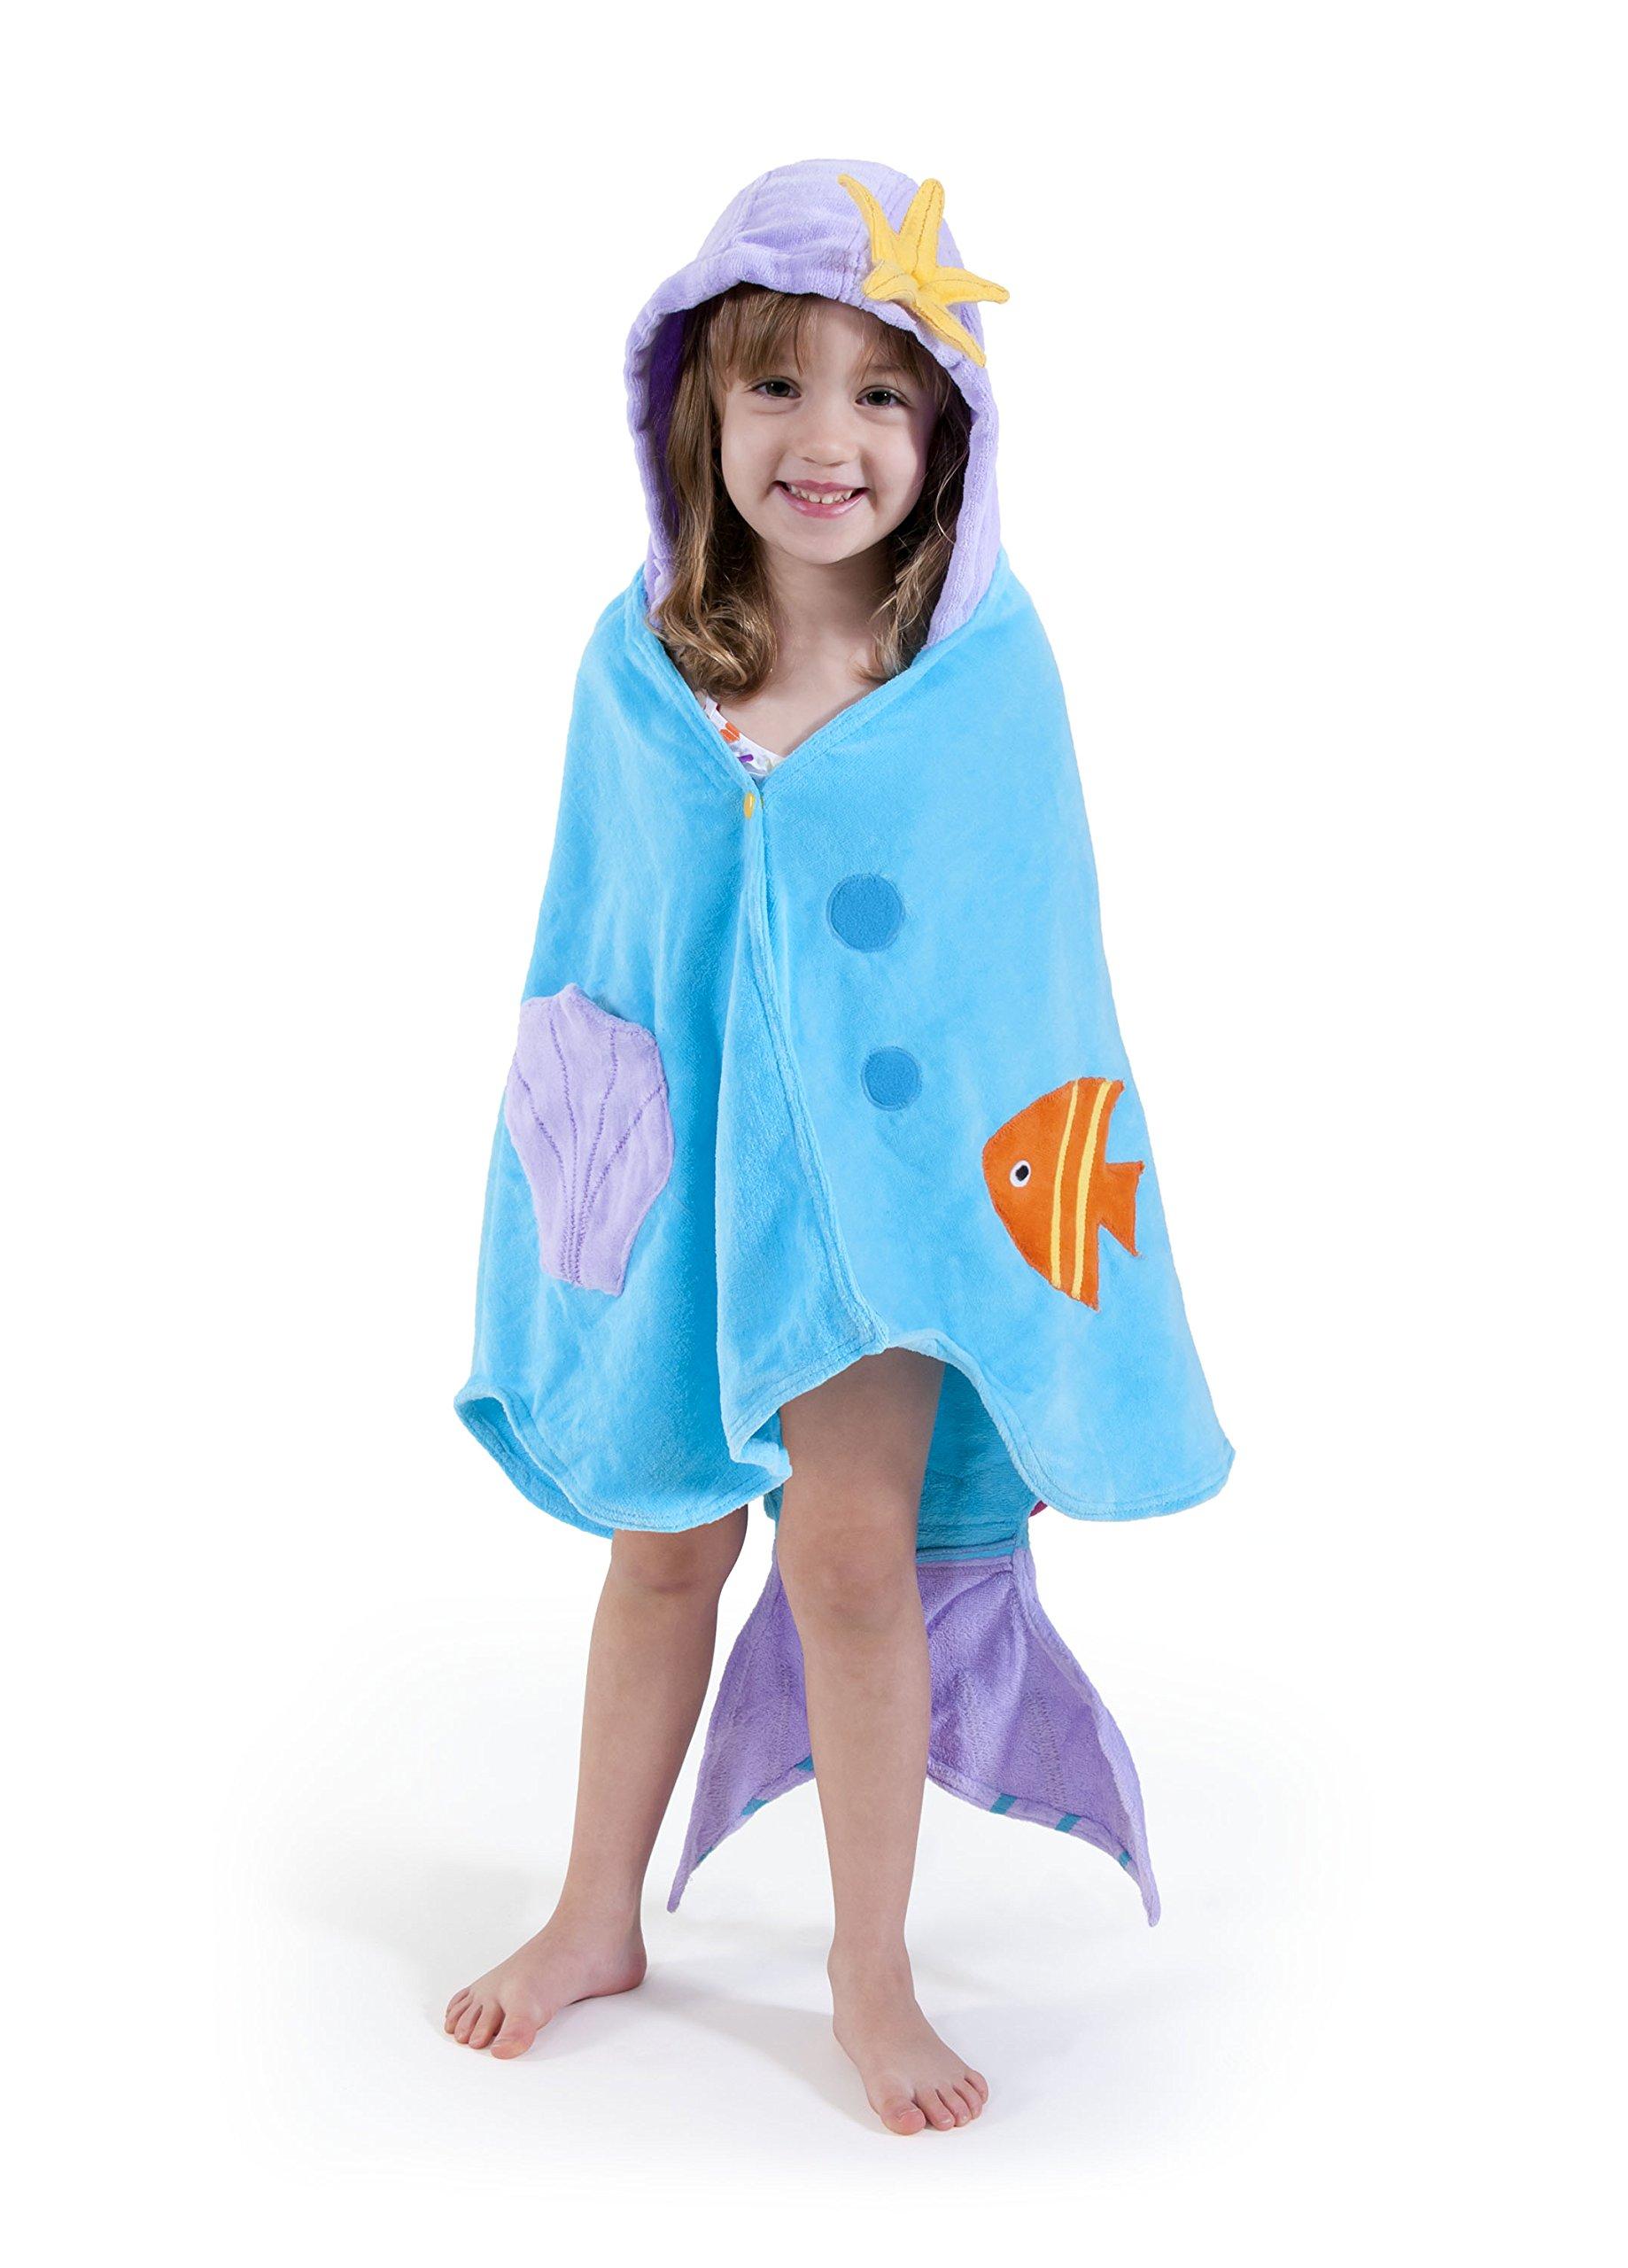 Kidorable - Toalla con capucha para niñas con cola de pescado y conchas 3